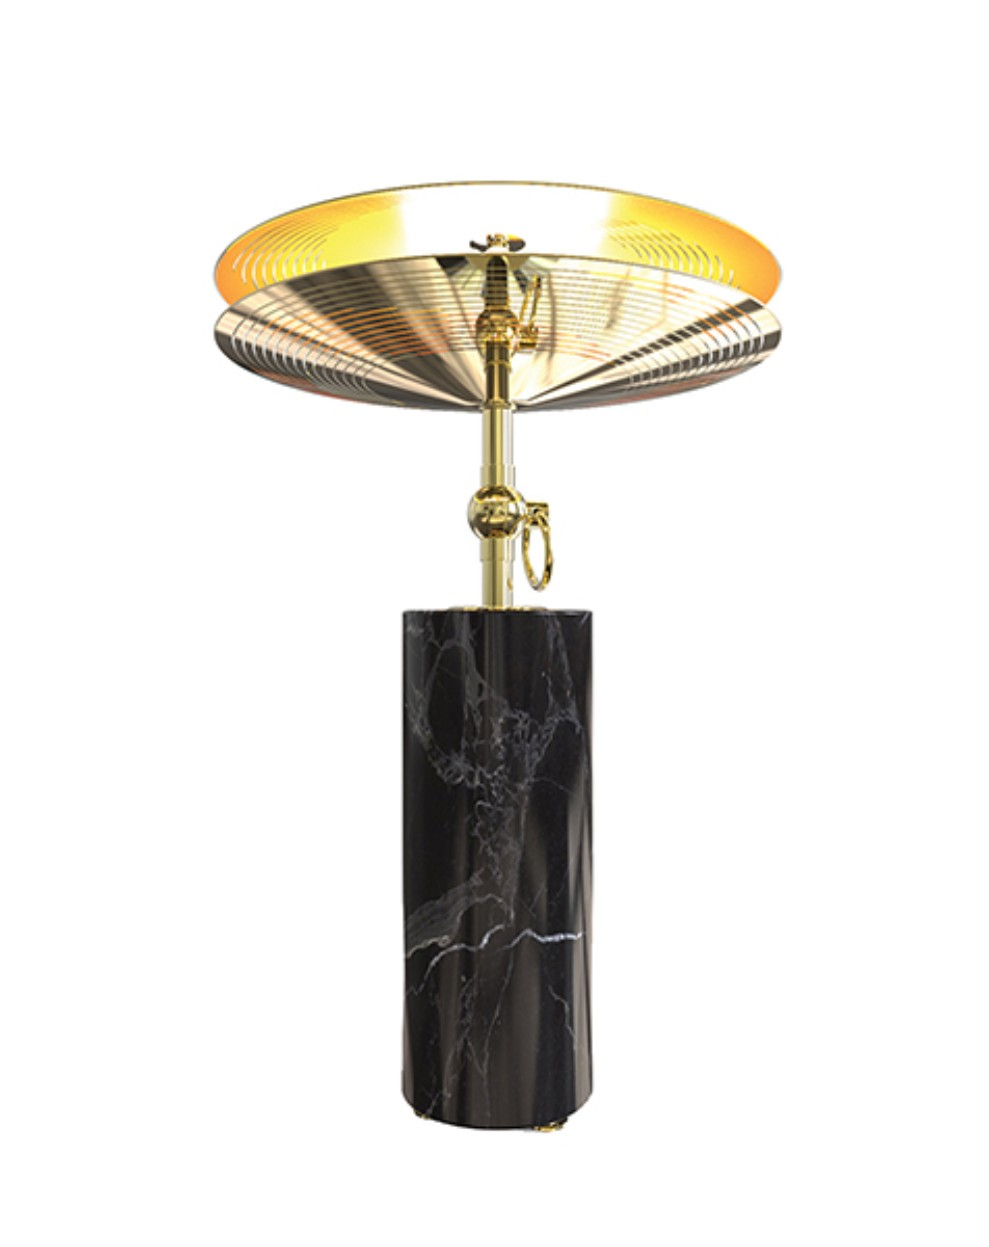 Breaking News DelightFULLs New Mid-Century Lighting Designs! 5 mid-century lighting designs Breaking News: DelightFULLs New Mid-Century Lighting Designs! Breaking News DelightFULLs New Mid Century Lighting Designs 5